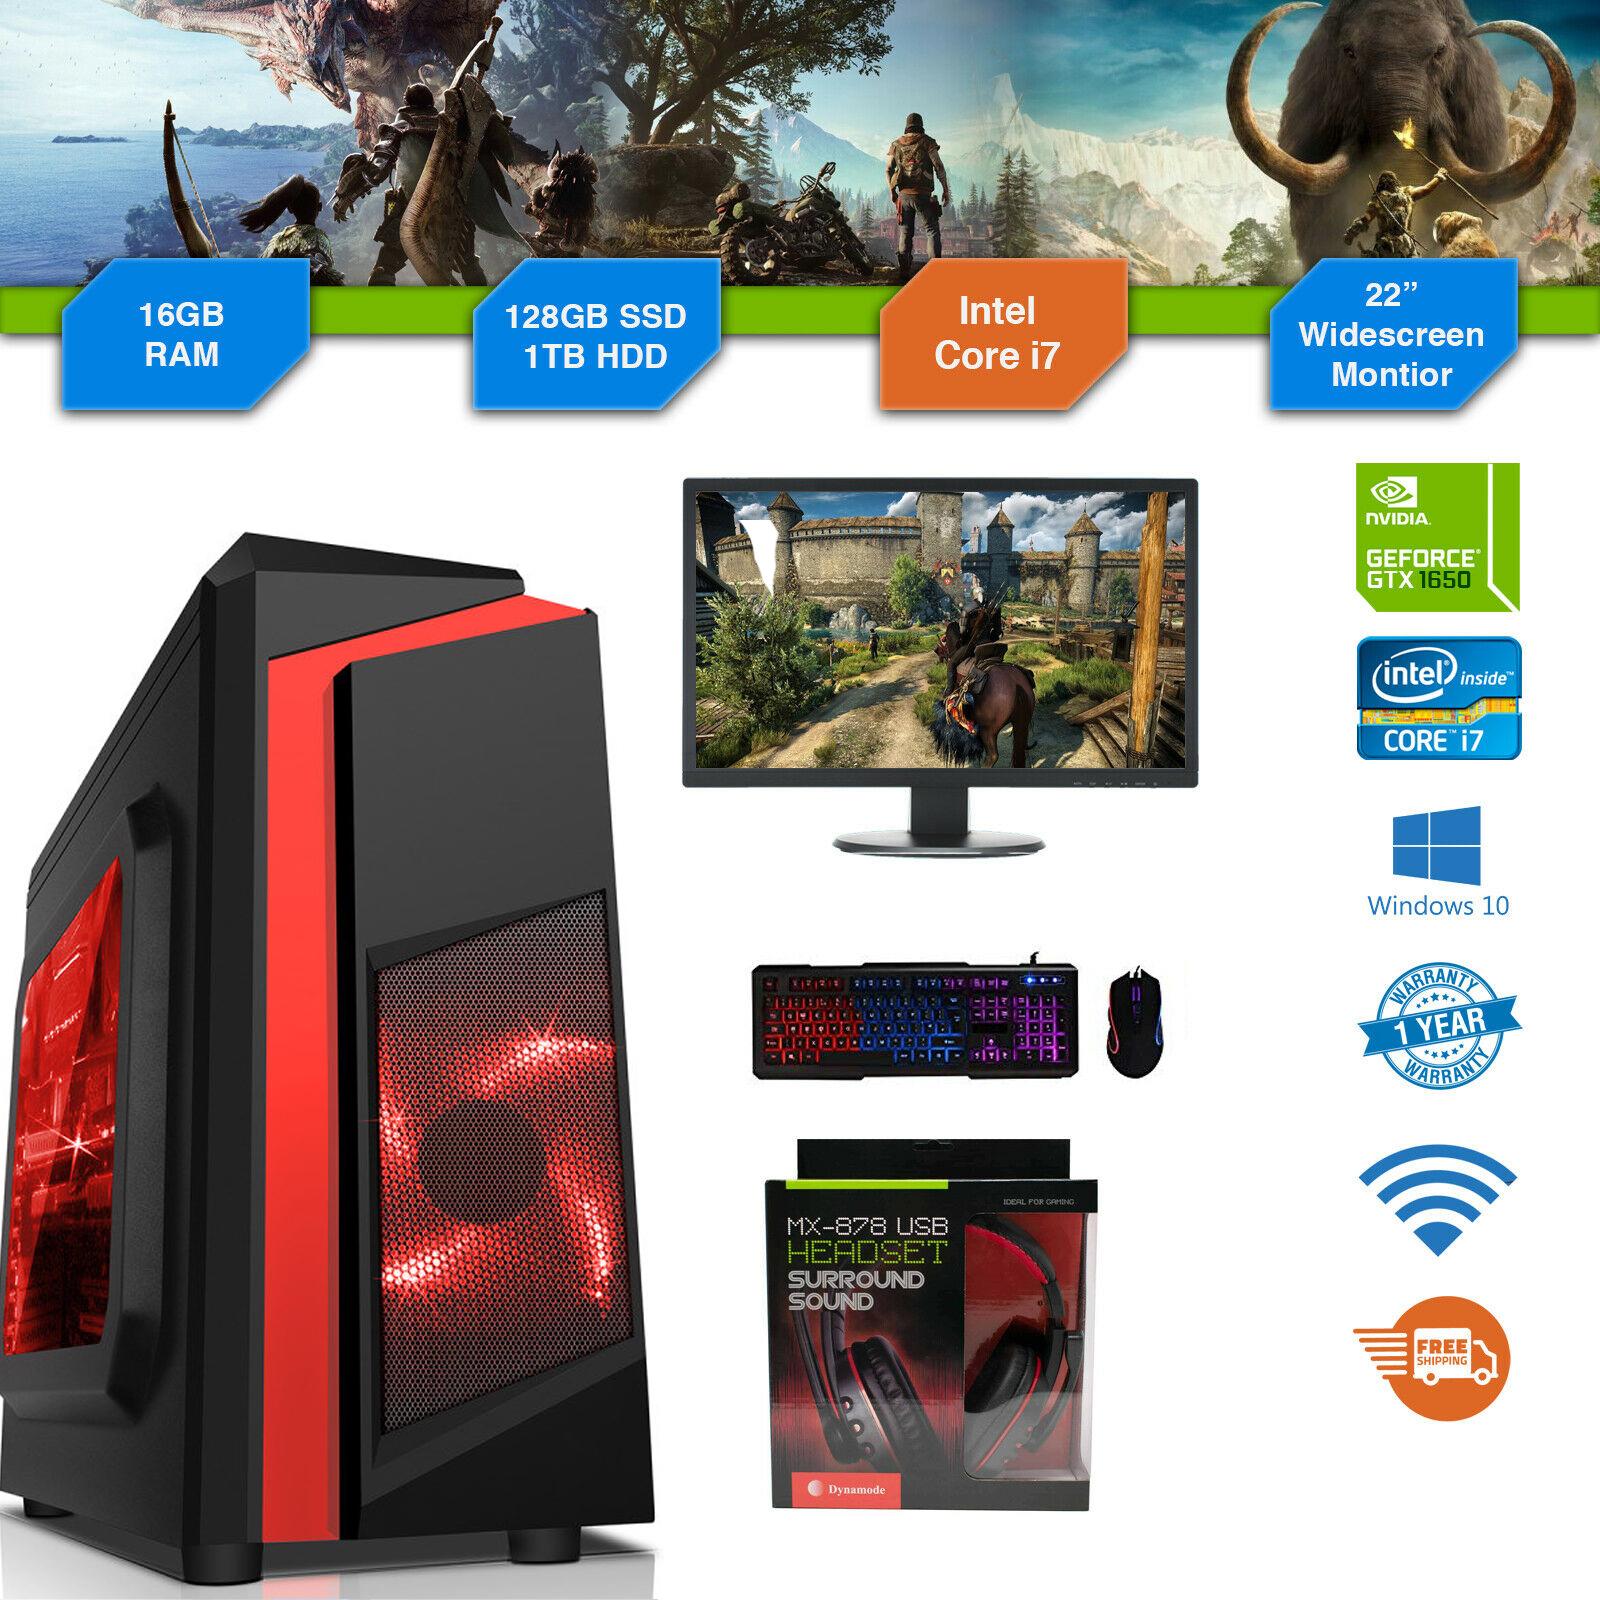 Cheap Custom Gaming PC Intel Core i7-9700 Win10 GTX1650 16GB DDR4 128GB SSD 1TB